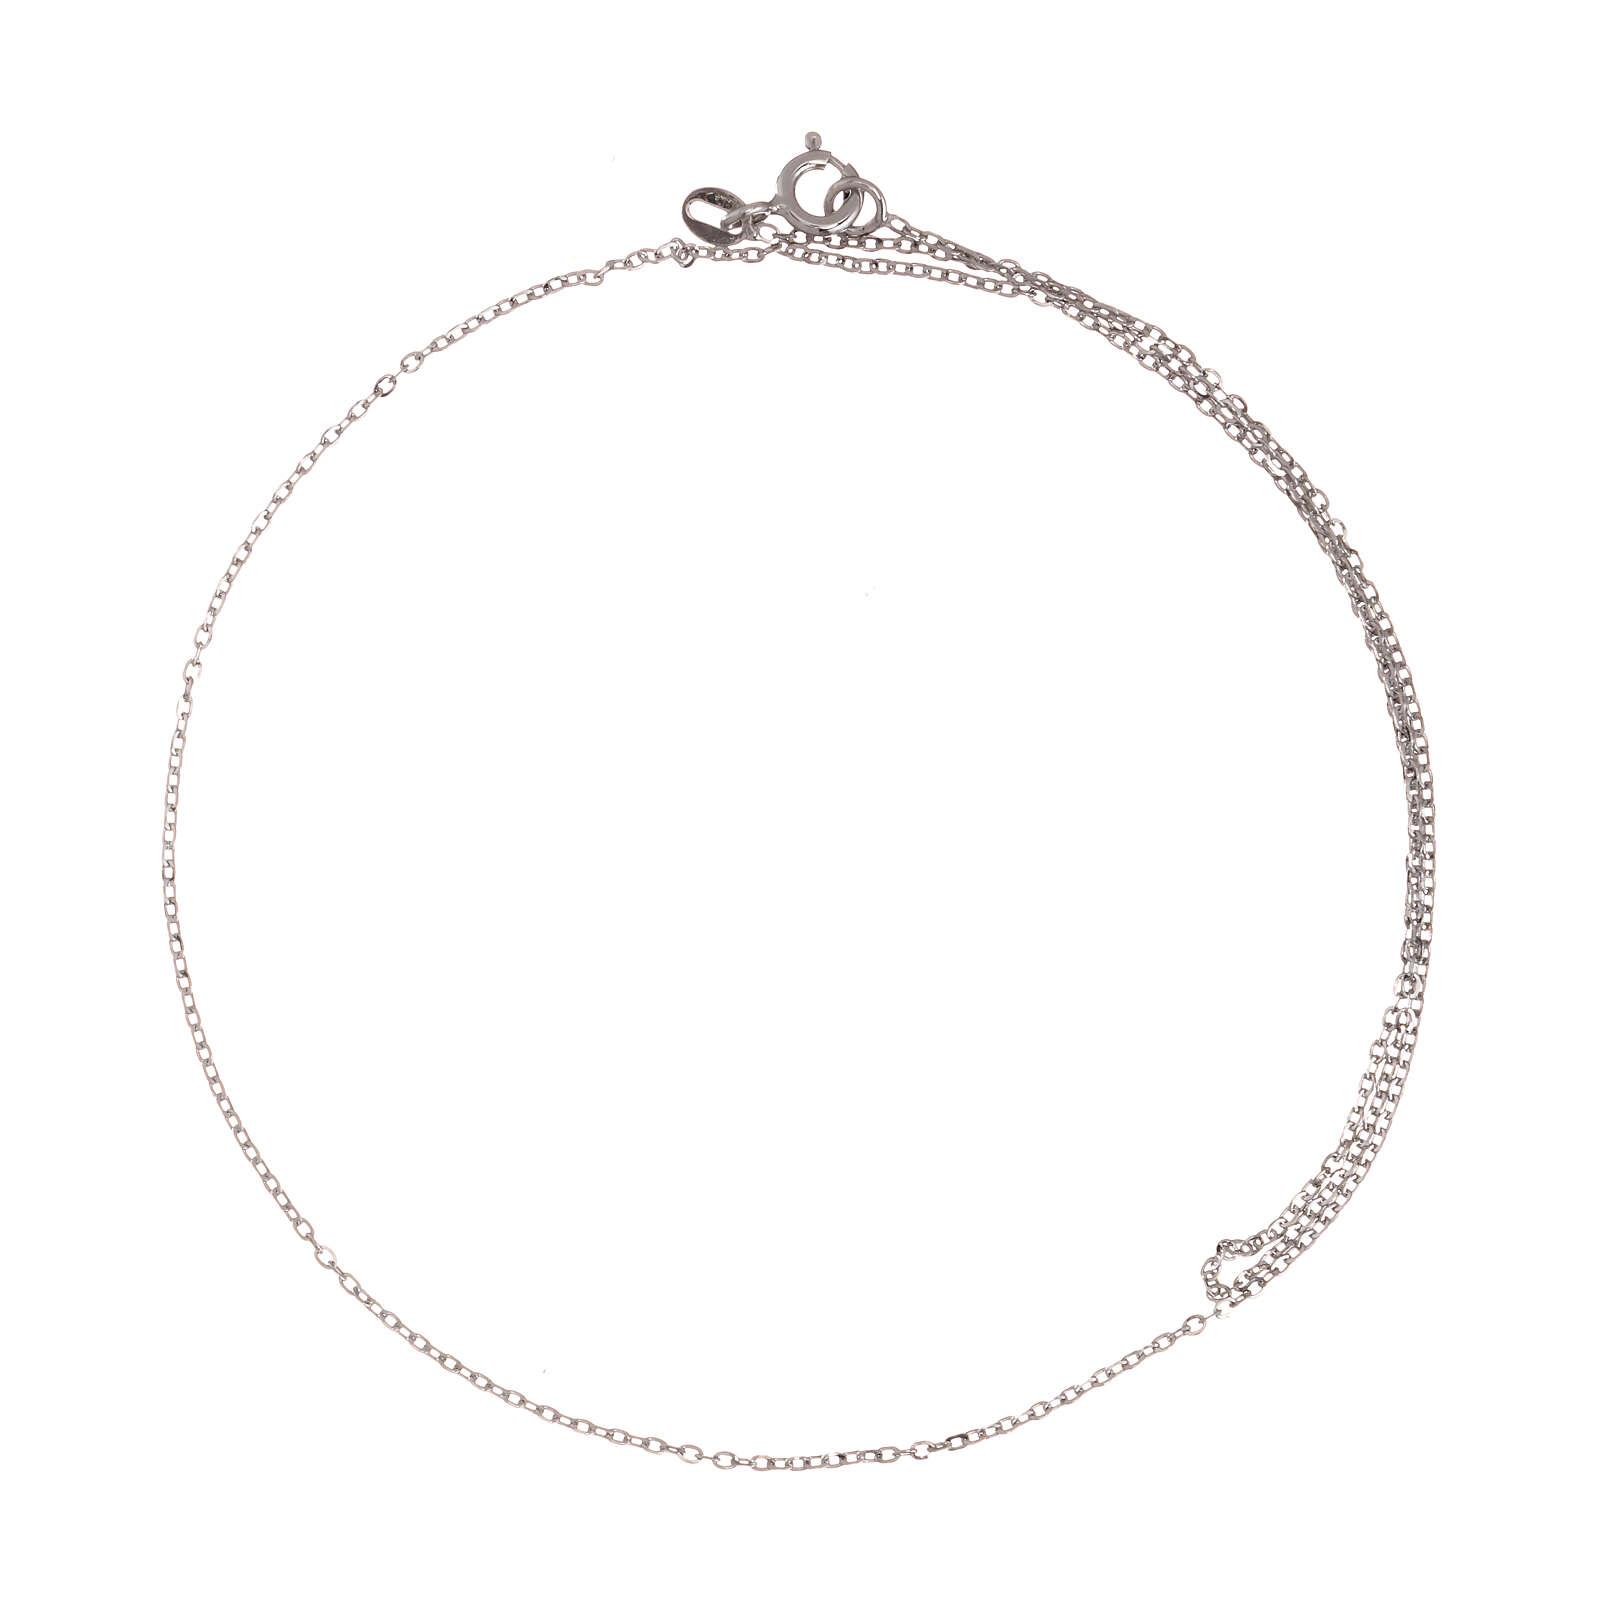 Cadena roló oro blanco 18 k diamantada 42 cm 4